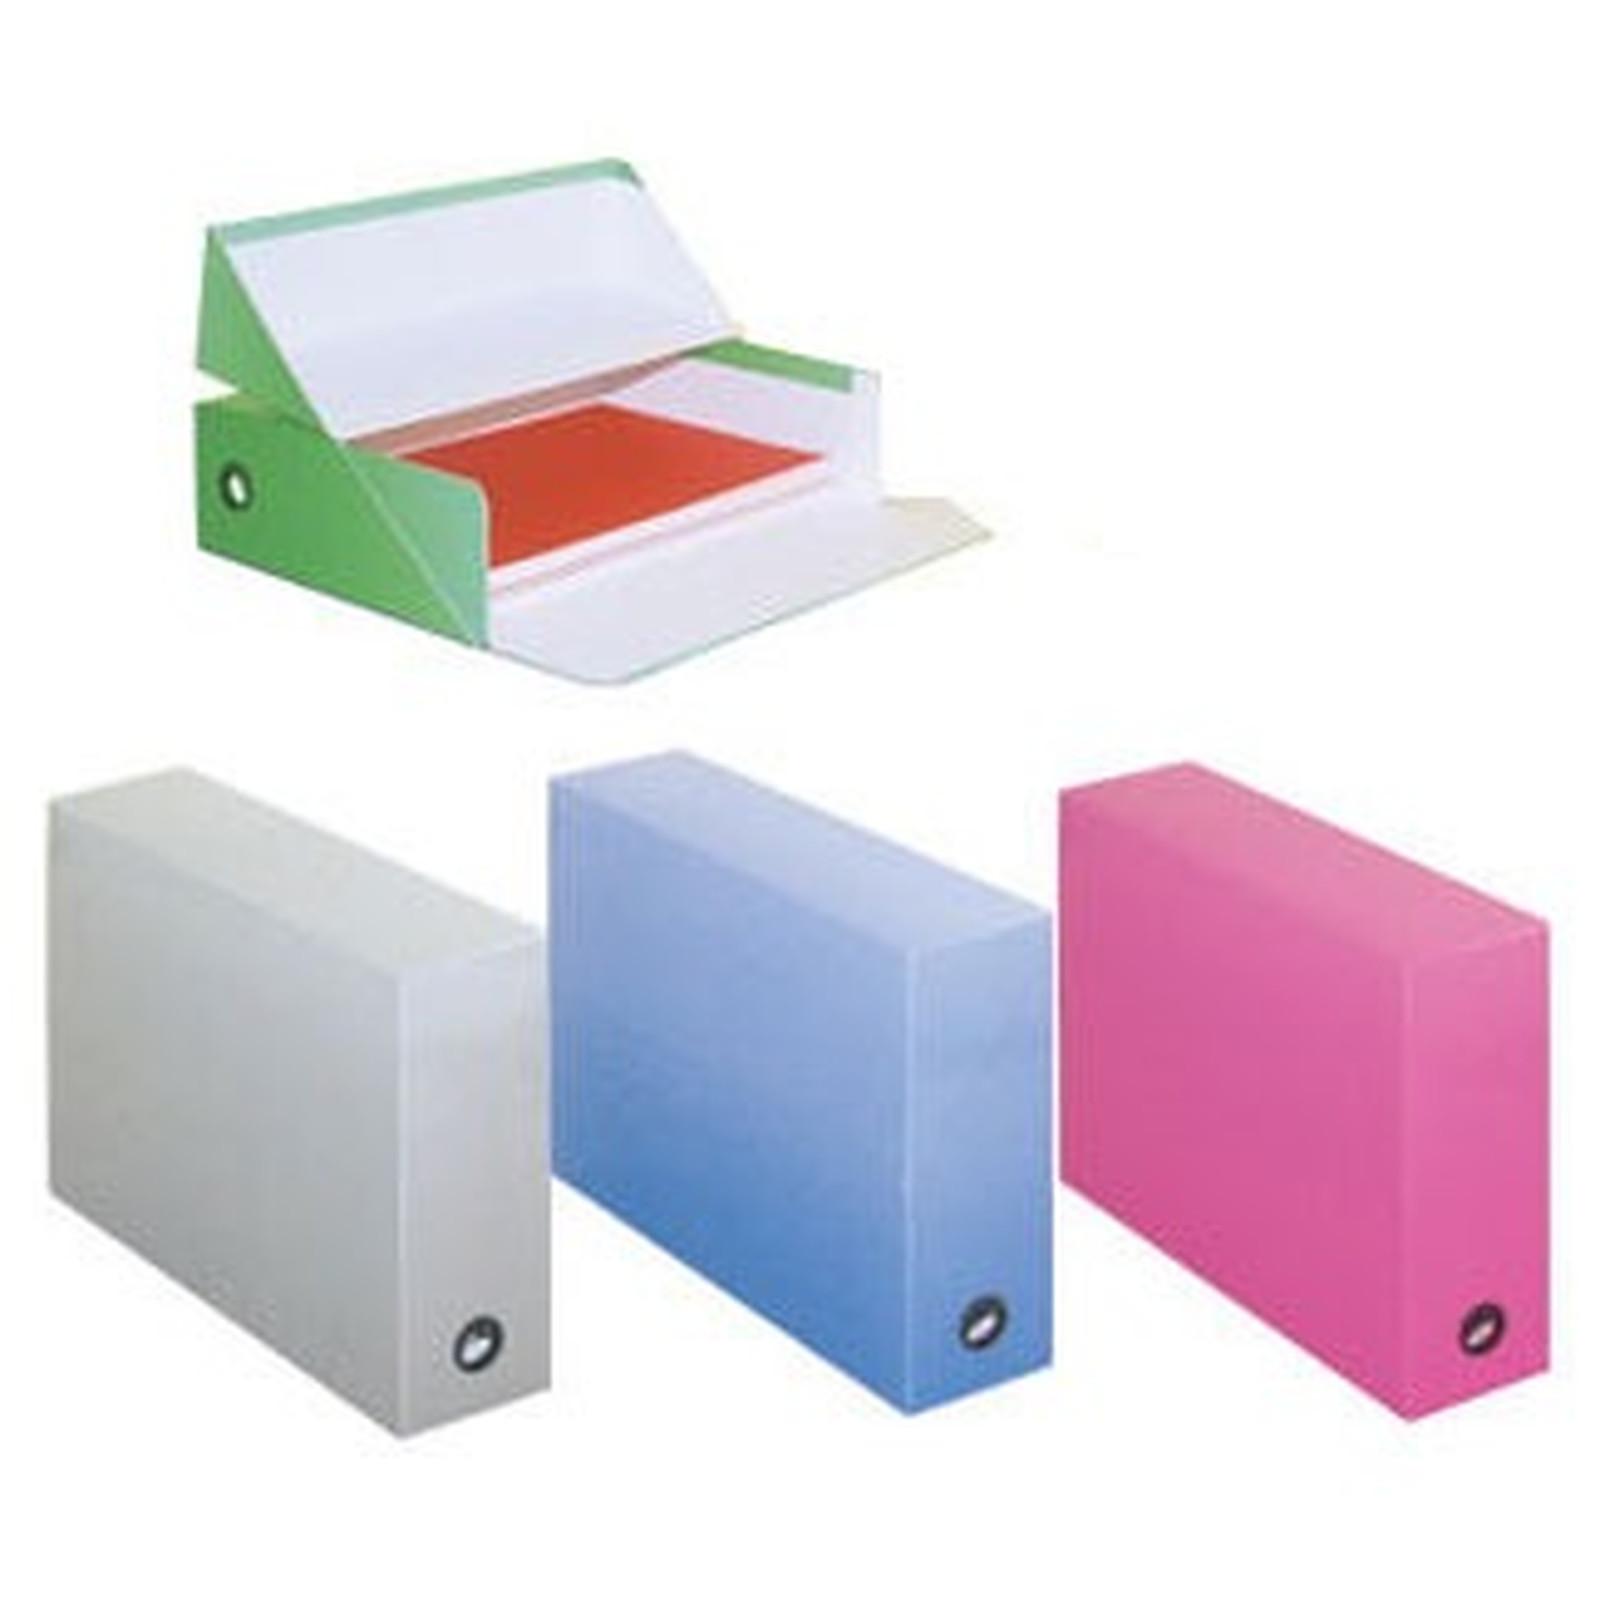 Fast boîte de transfert Pastel - Vert